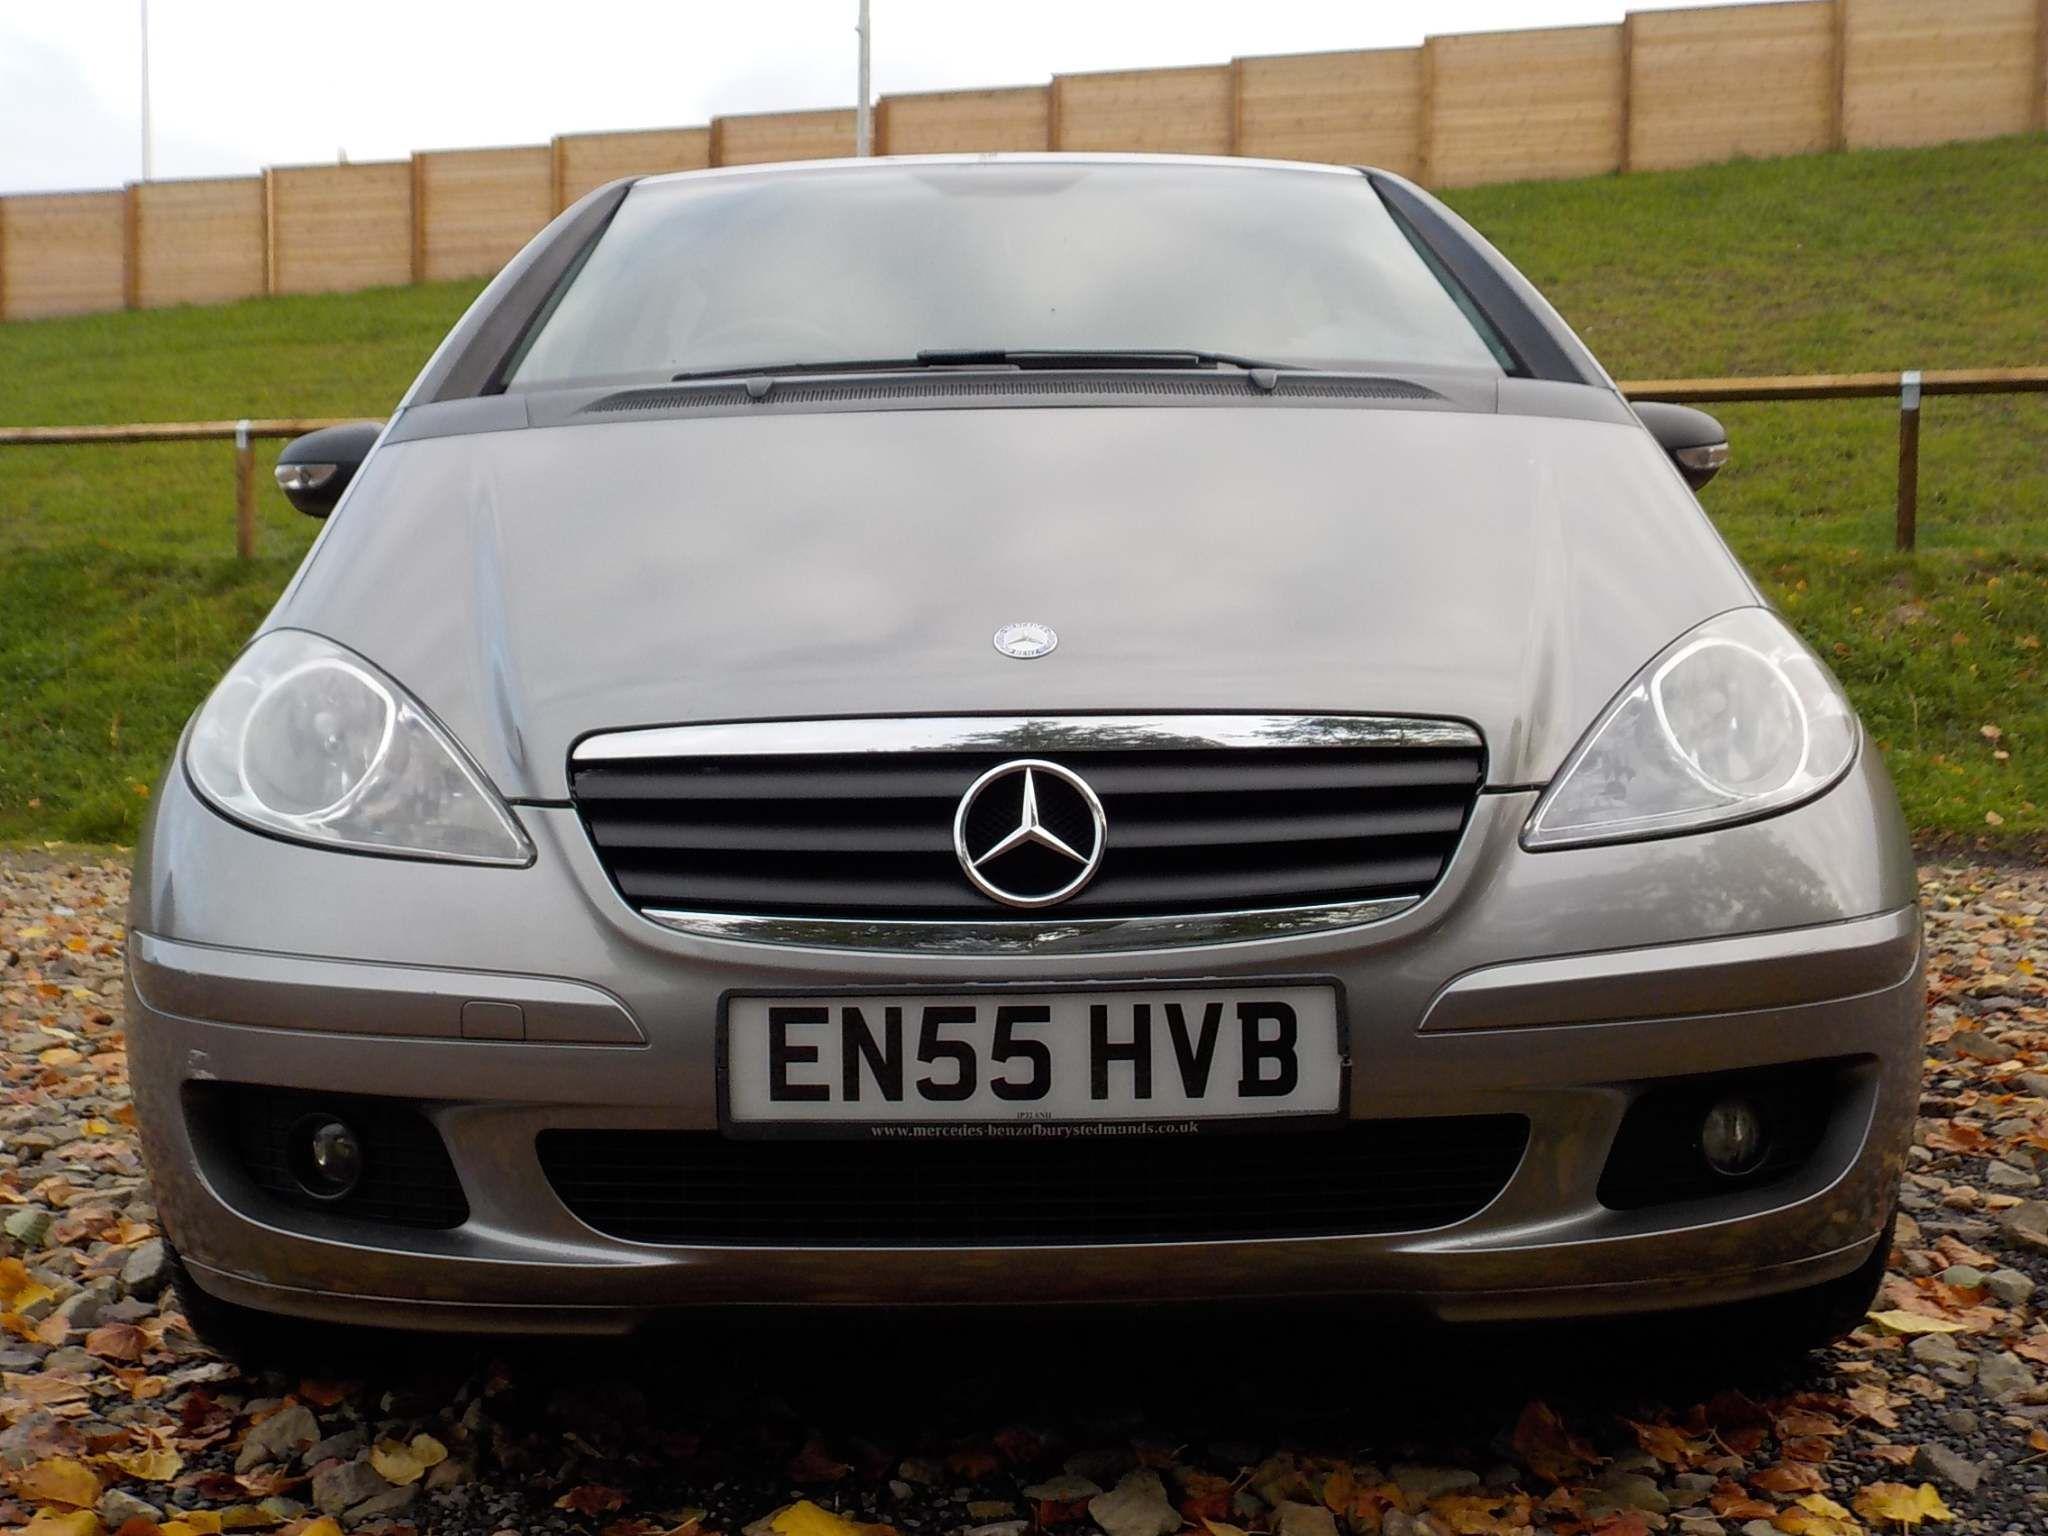 Mercedes-Benz A Class 1.5 A150 Classic 5dr